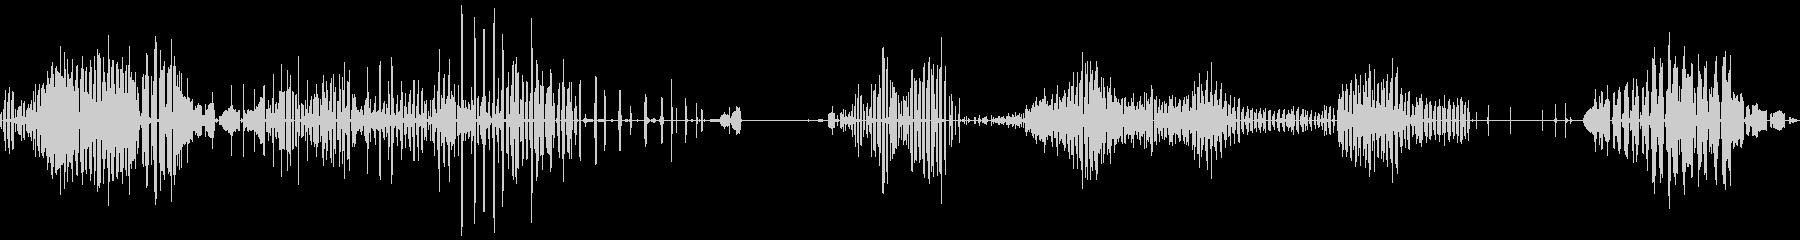 PLOVER / LAPWING ...の未再生の波形